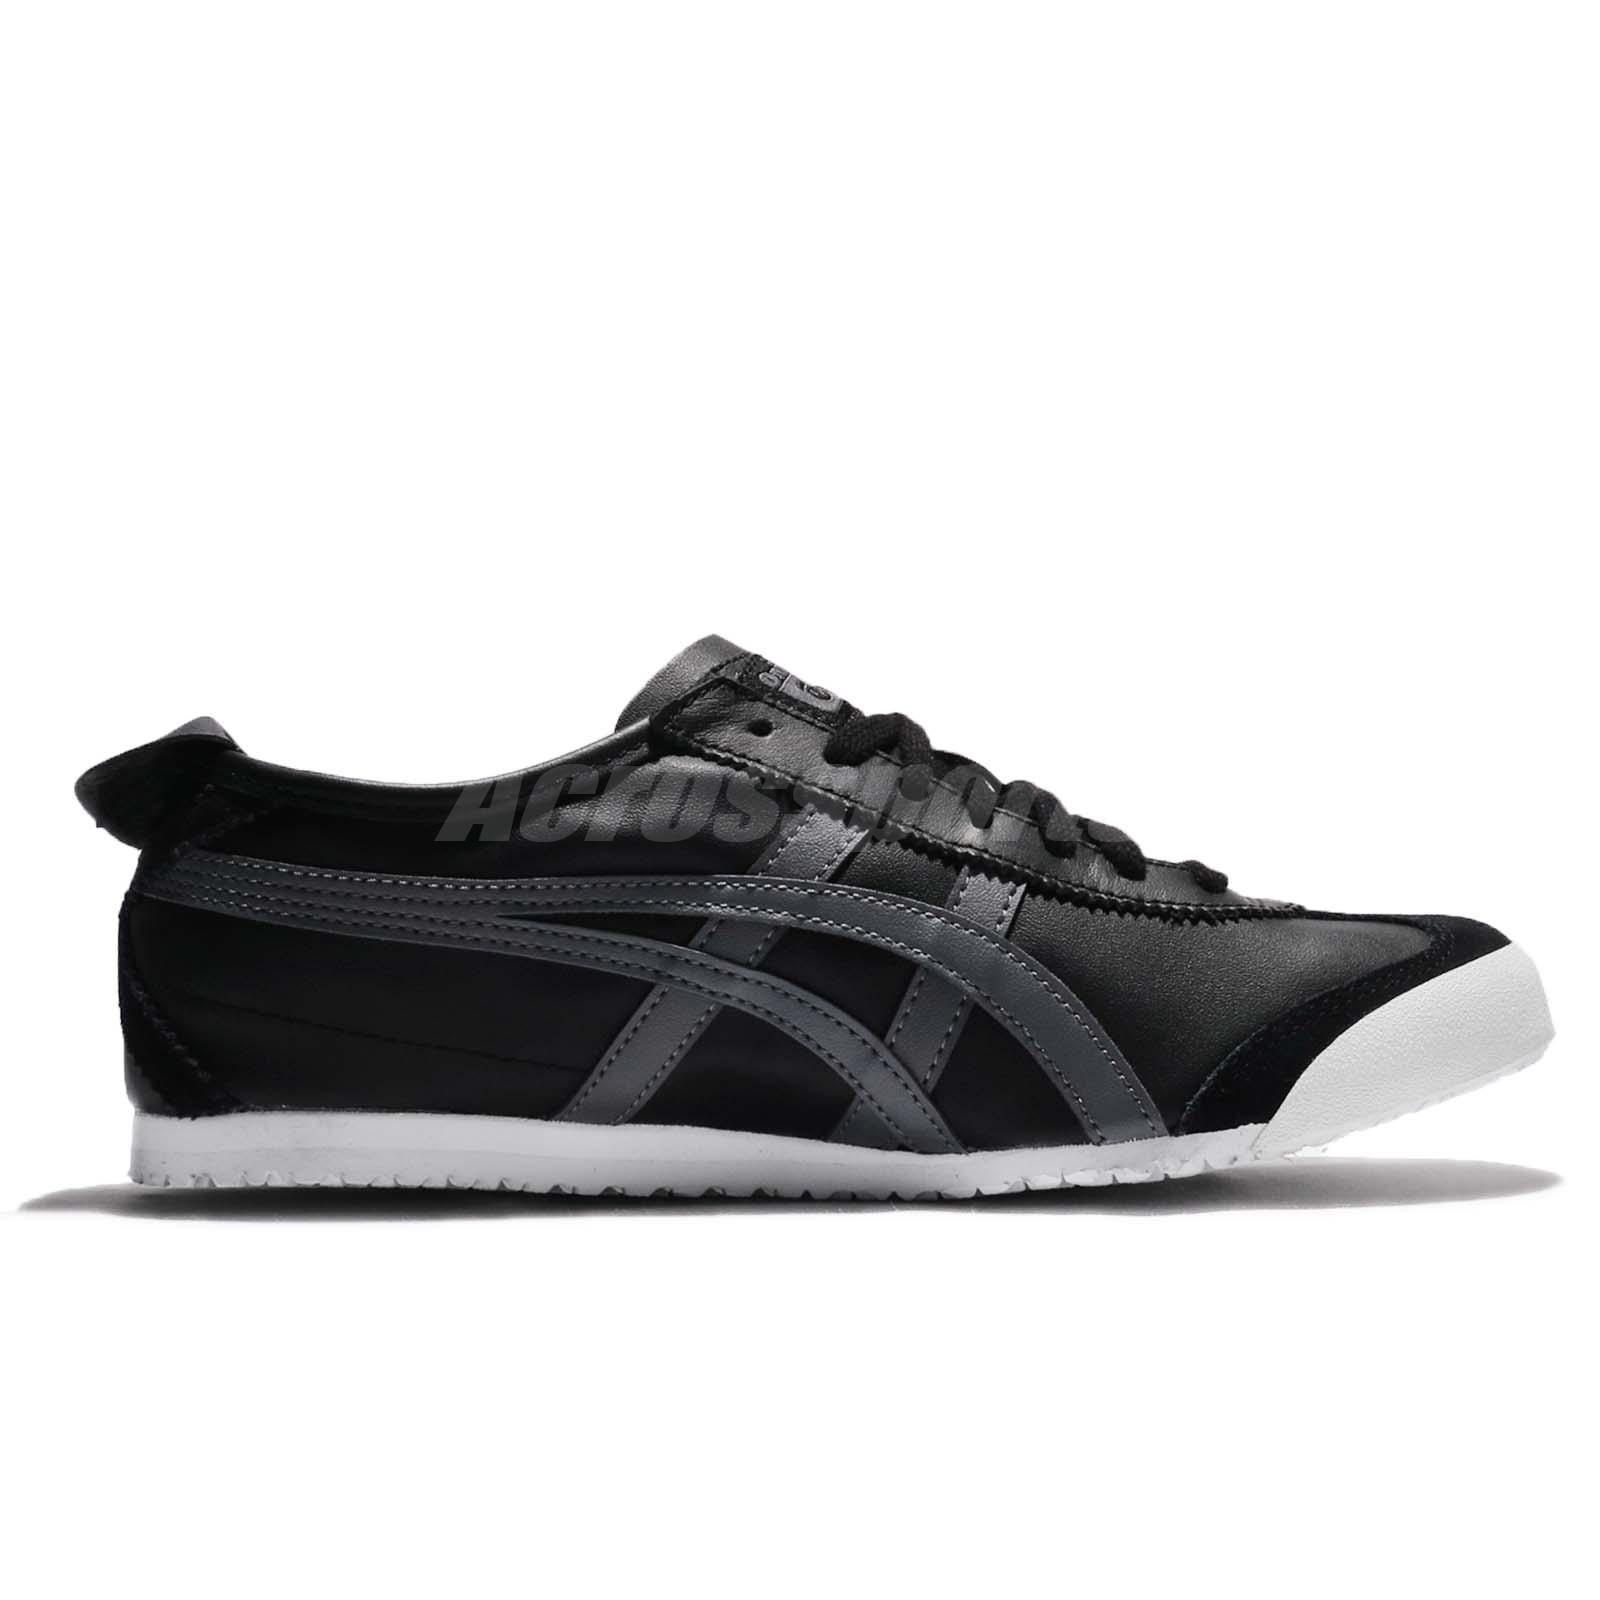 innovative design cec52 10981 Details about Asics Onitsuka Tiger Mexico 66 Black Carbon Men Shoes  Sneakers D4J2L-9097